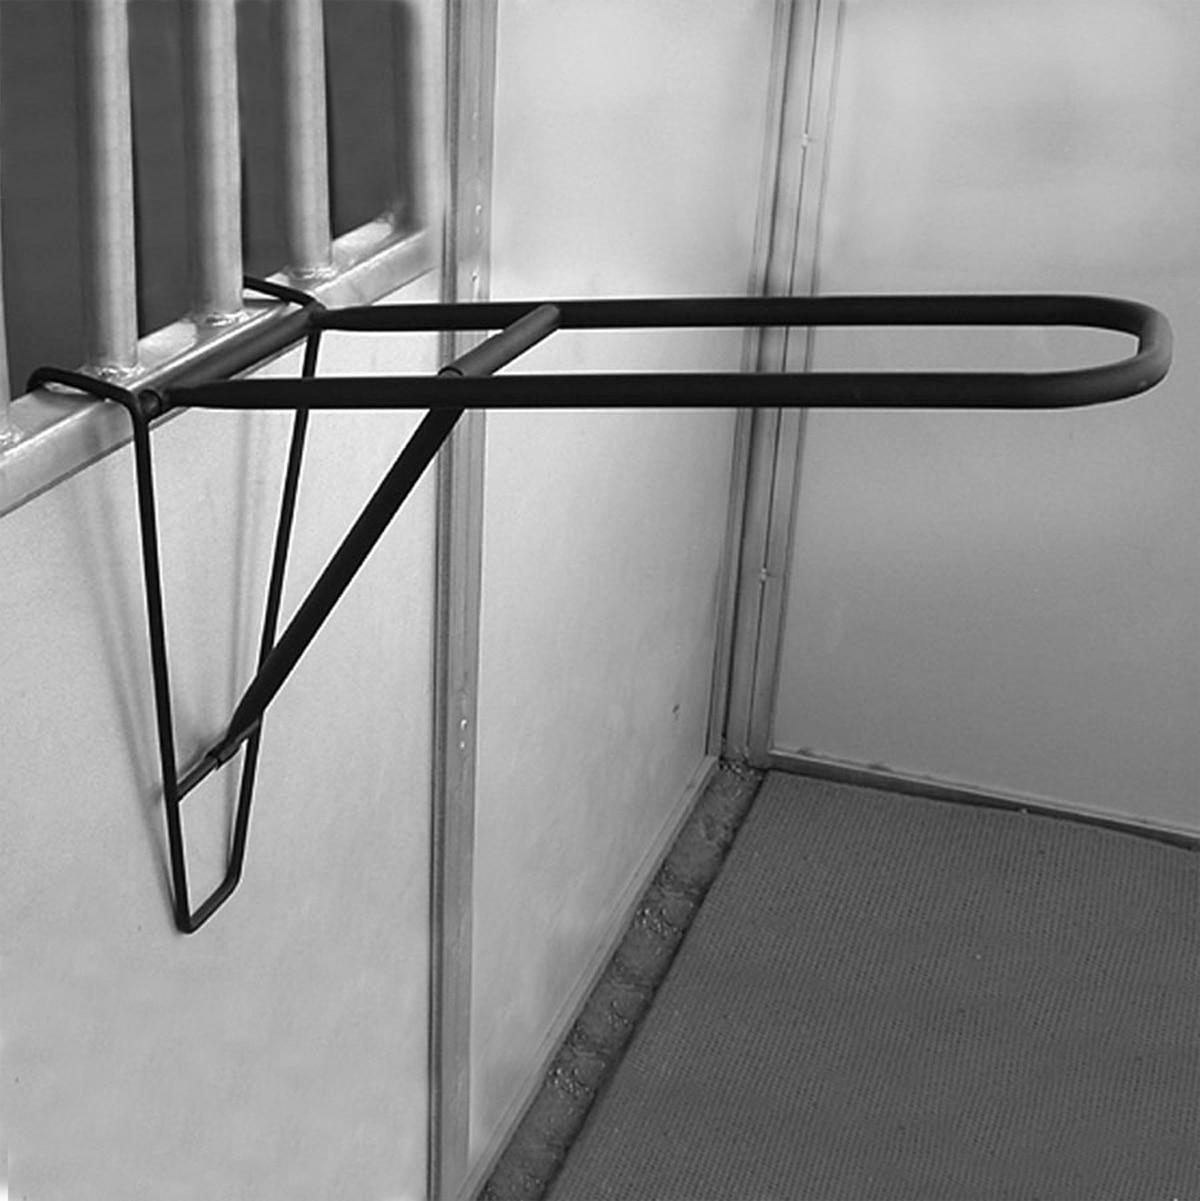 4 HOOK Horse Portable Tack Rack Holder ~ Hangs On Stable Door Wall//Float